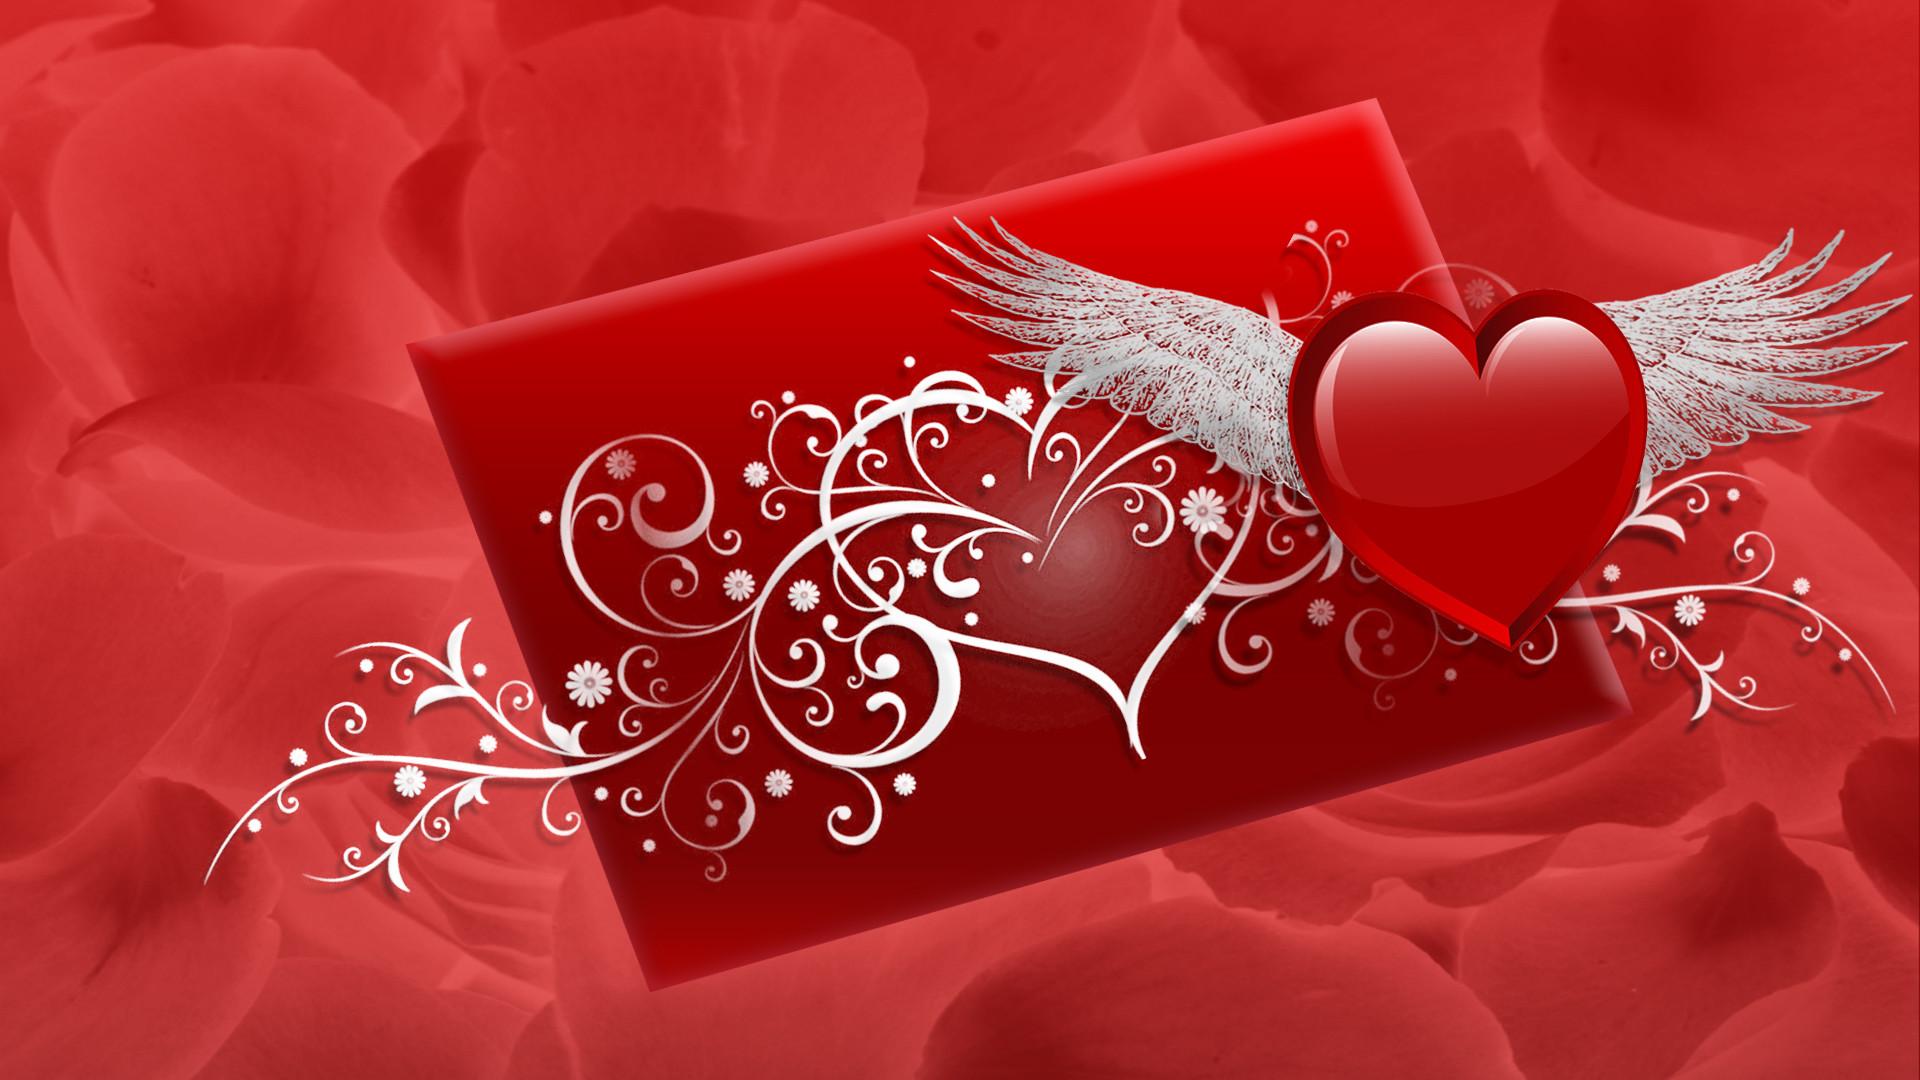 1920x1080 Valentine Screensaver Wallpaper   342896